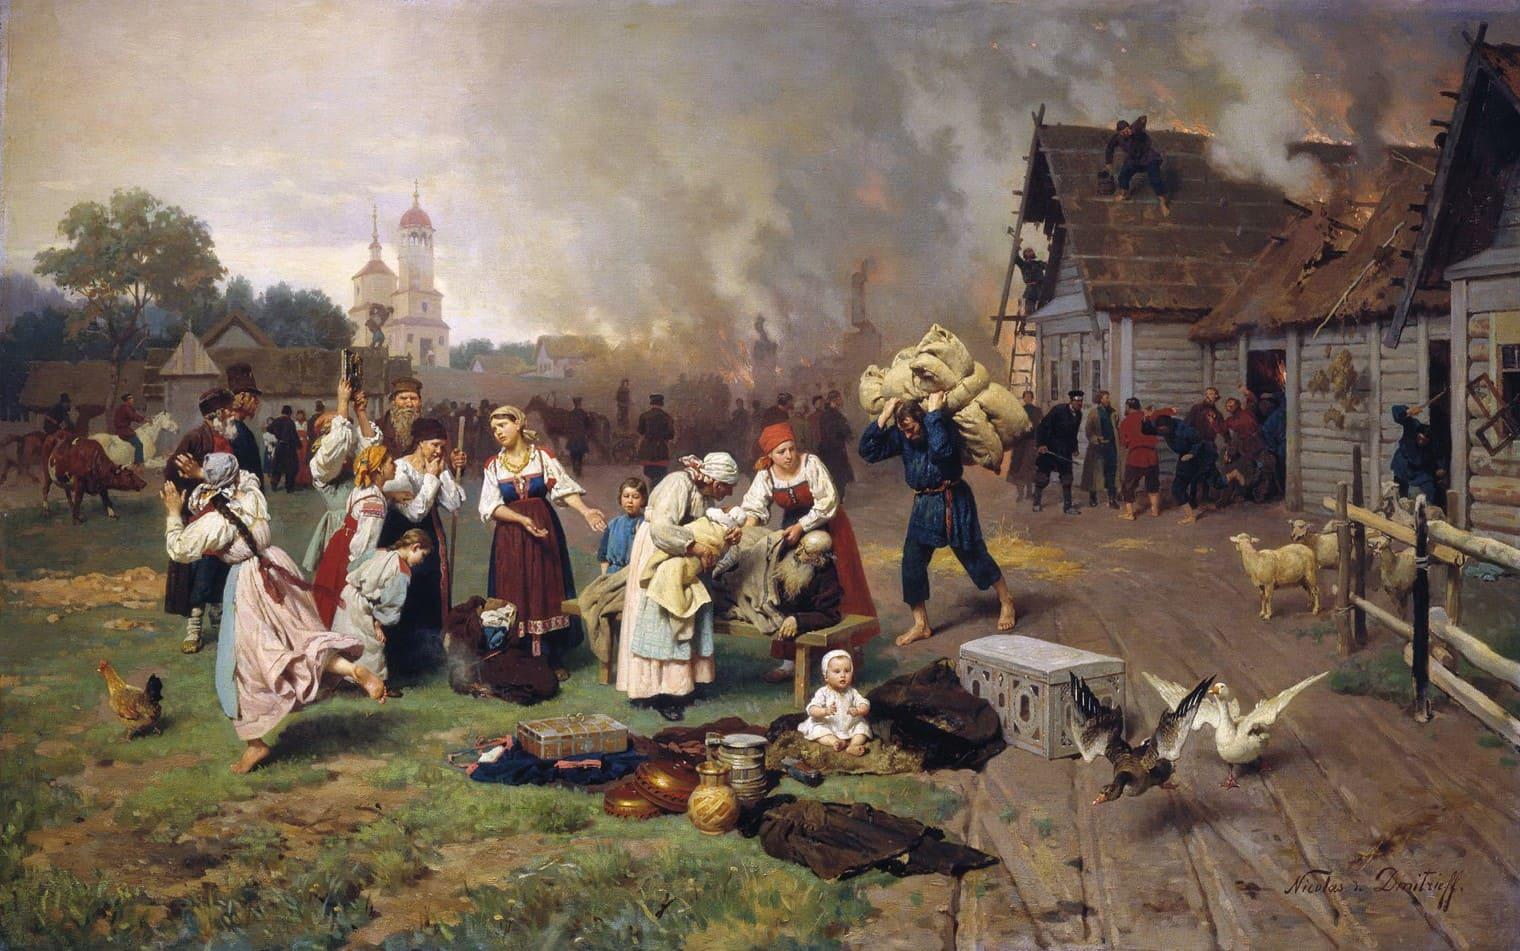 Художник Николай Дмитриев-Оренбургский (1837 – 1898). Мечи и орала